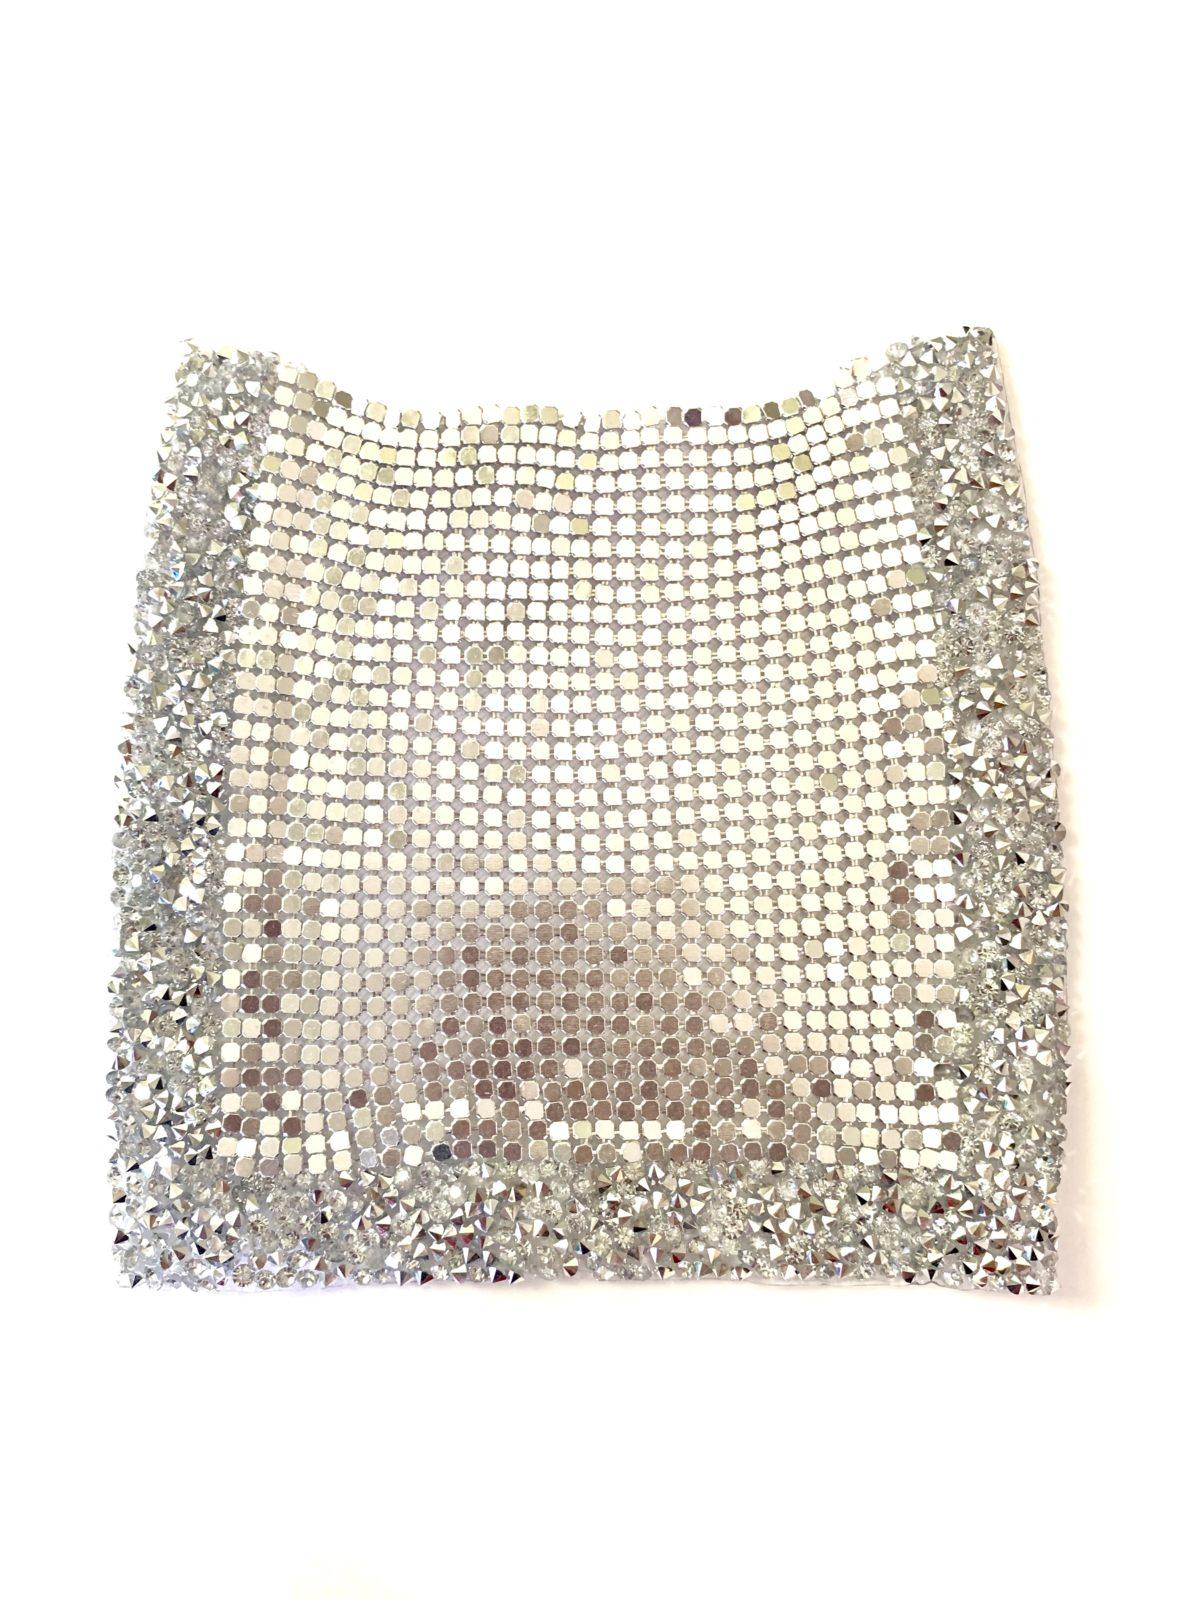 NEW Rhinestone Pocket Patch, Applique,  Iron On, Hot fix,  DIY clothing 2